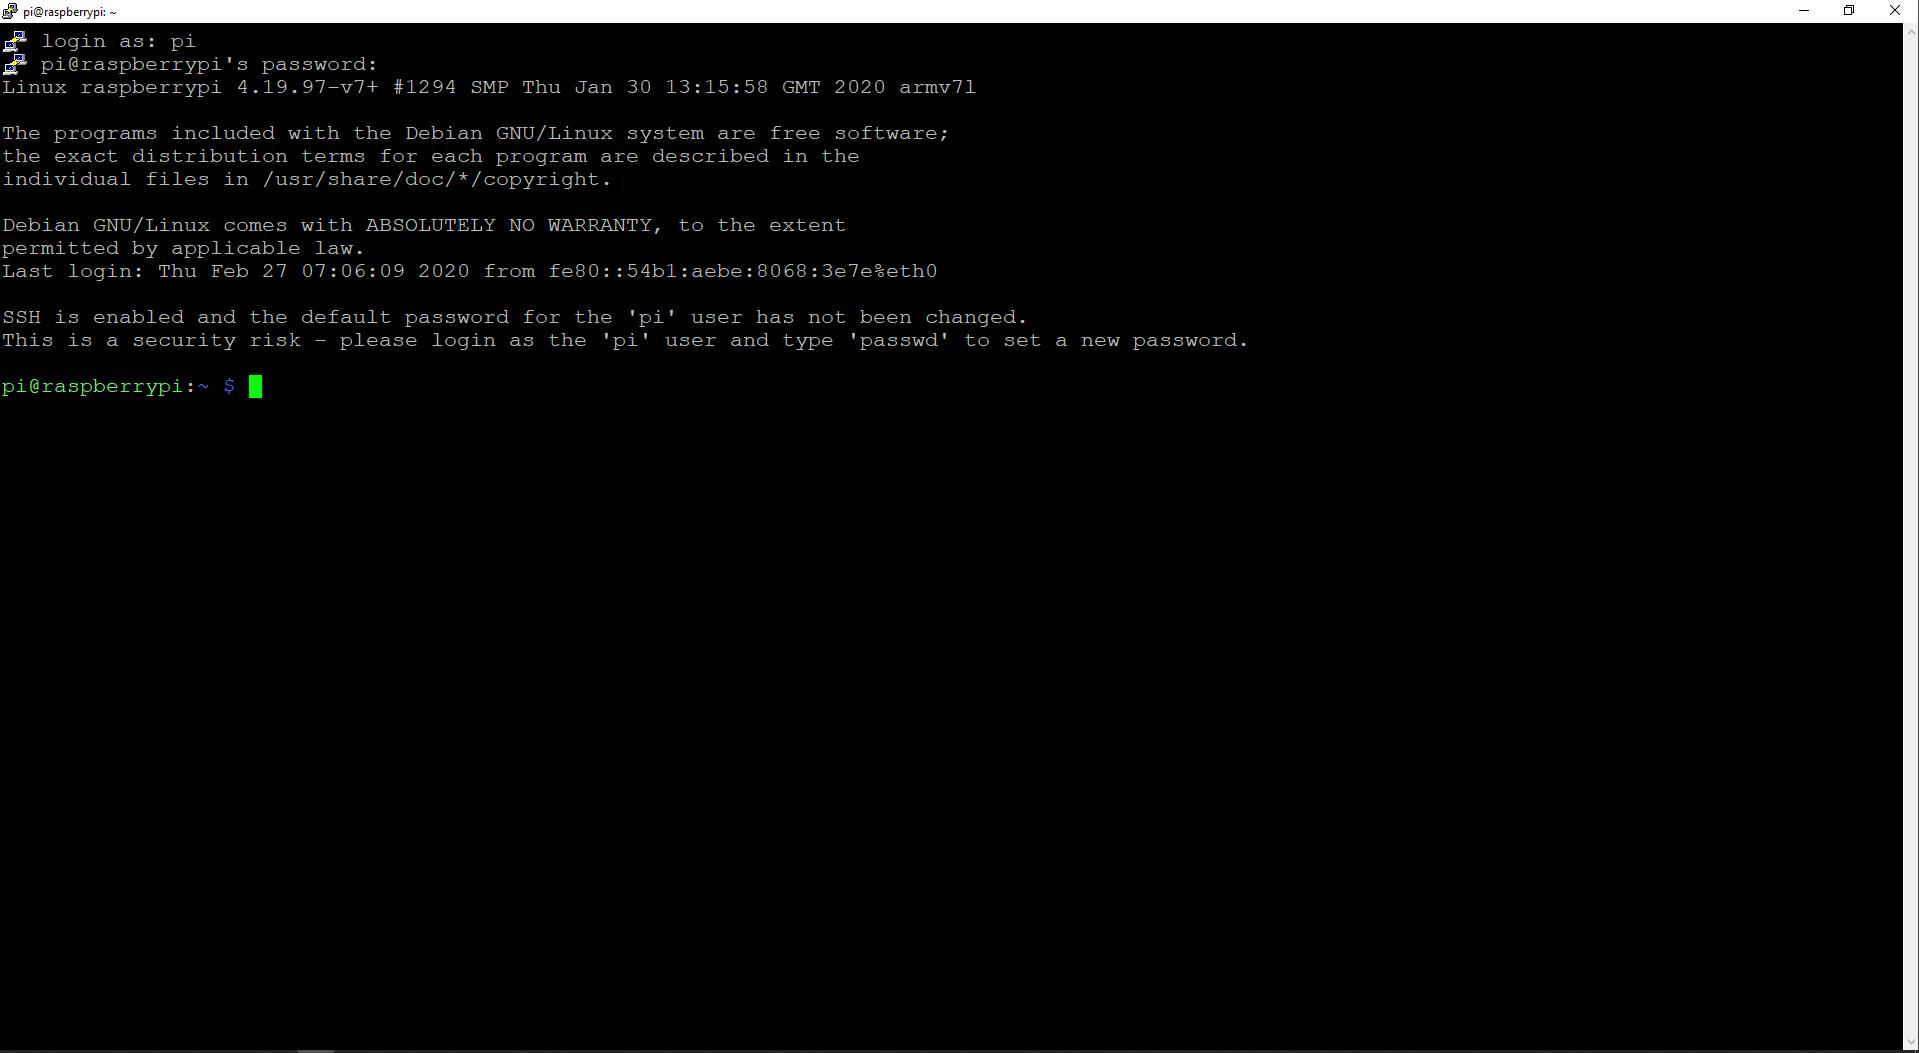 Raspberry_Pi_Fingerprint_Scanner_RW_MP_image14.png